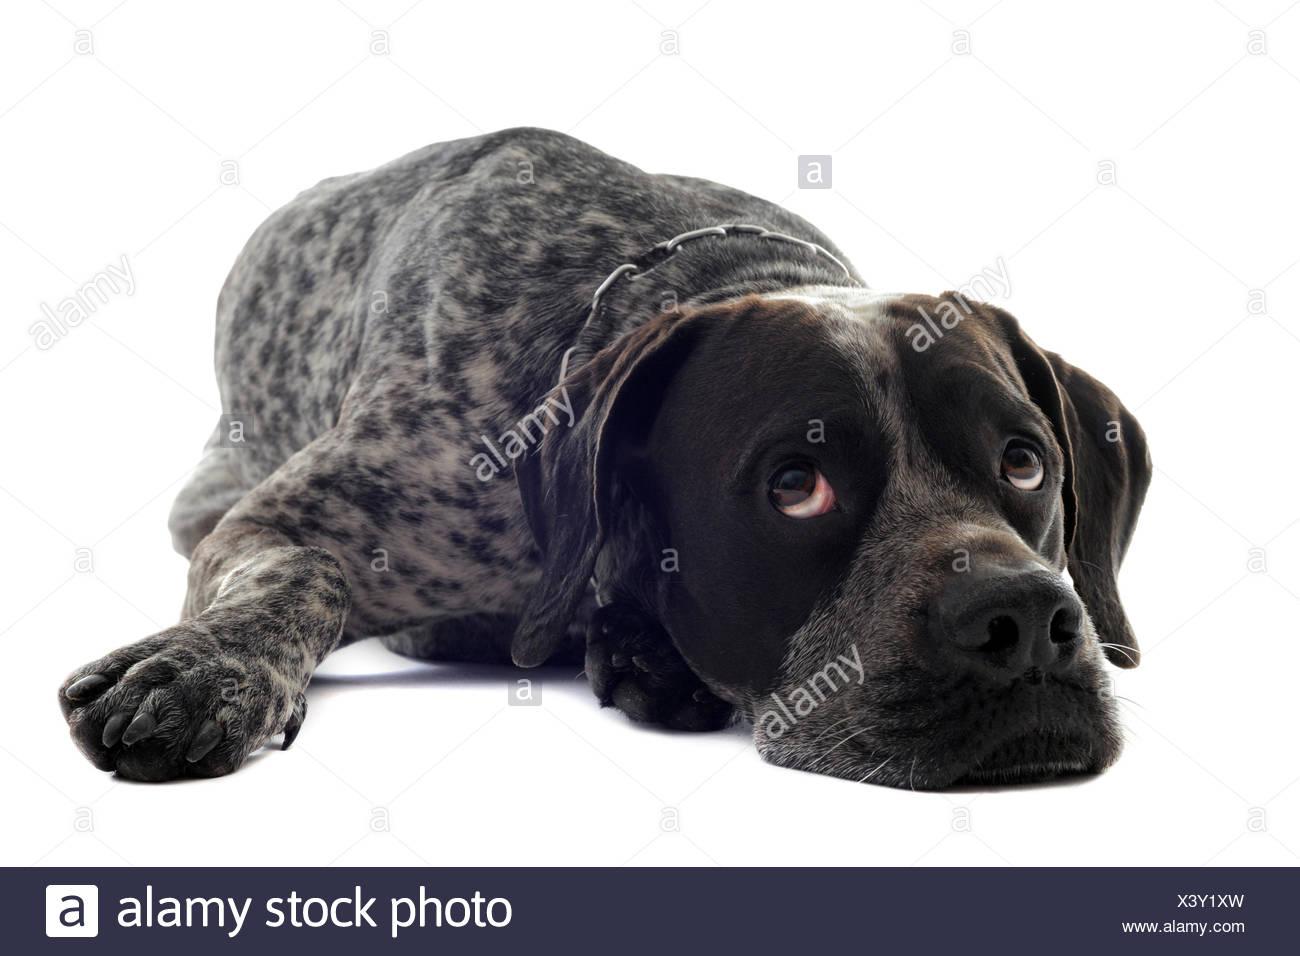 animal pointer dog beautiful beauteously nice pet portrait sad eyes studio sadness tired canine young younger grey gray beauty - Stock Image